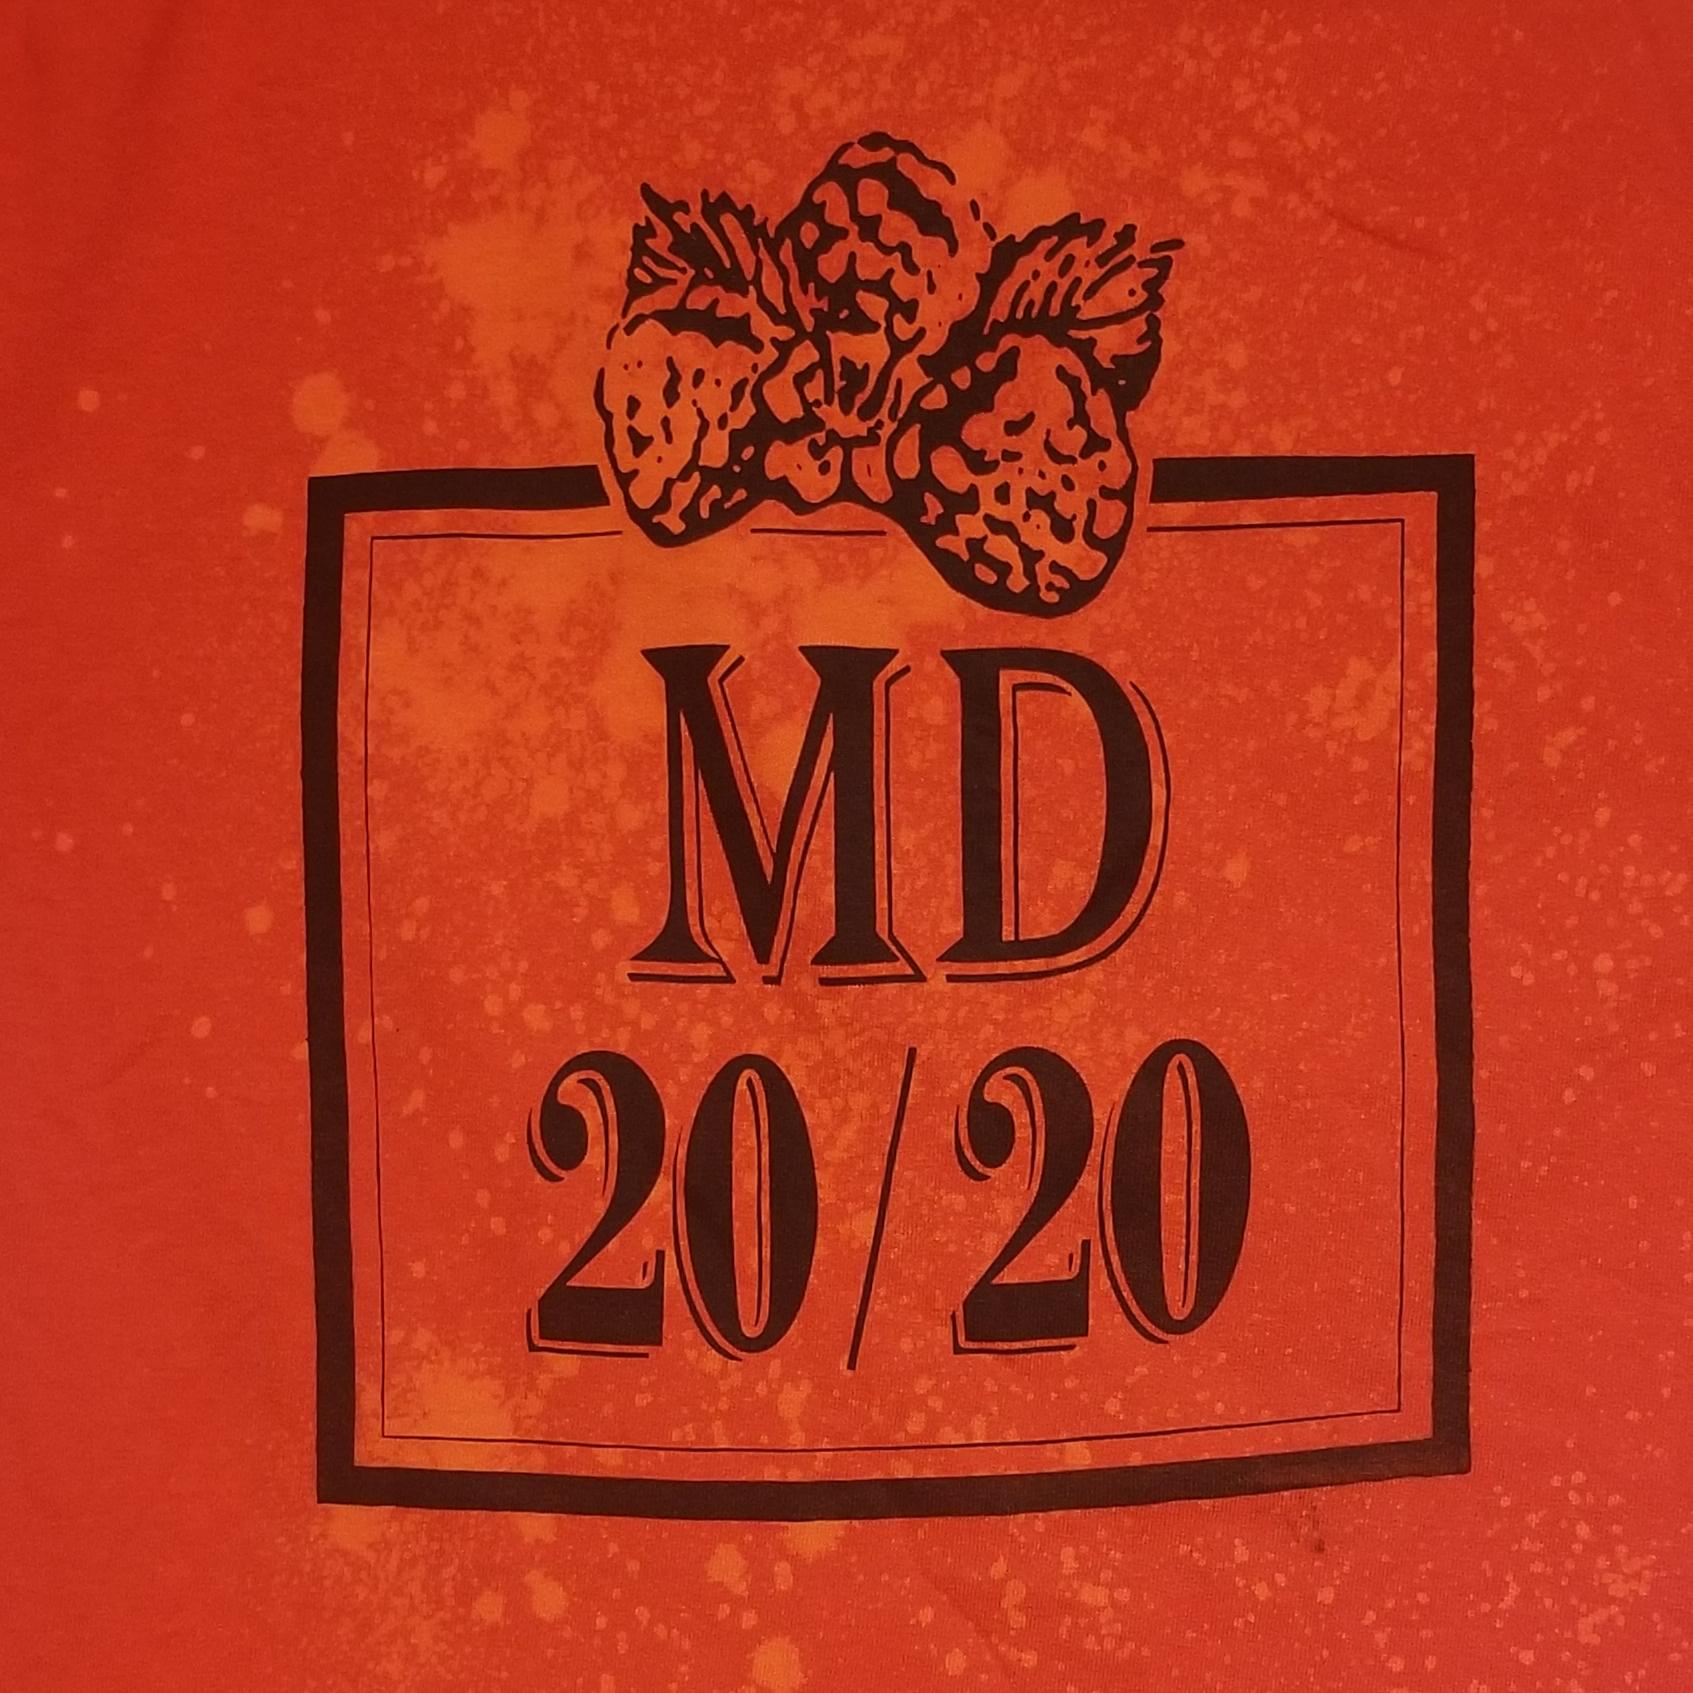 Mad Dog 20/20 Tshirt